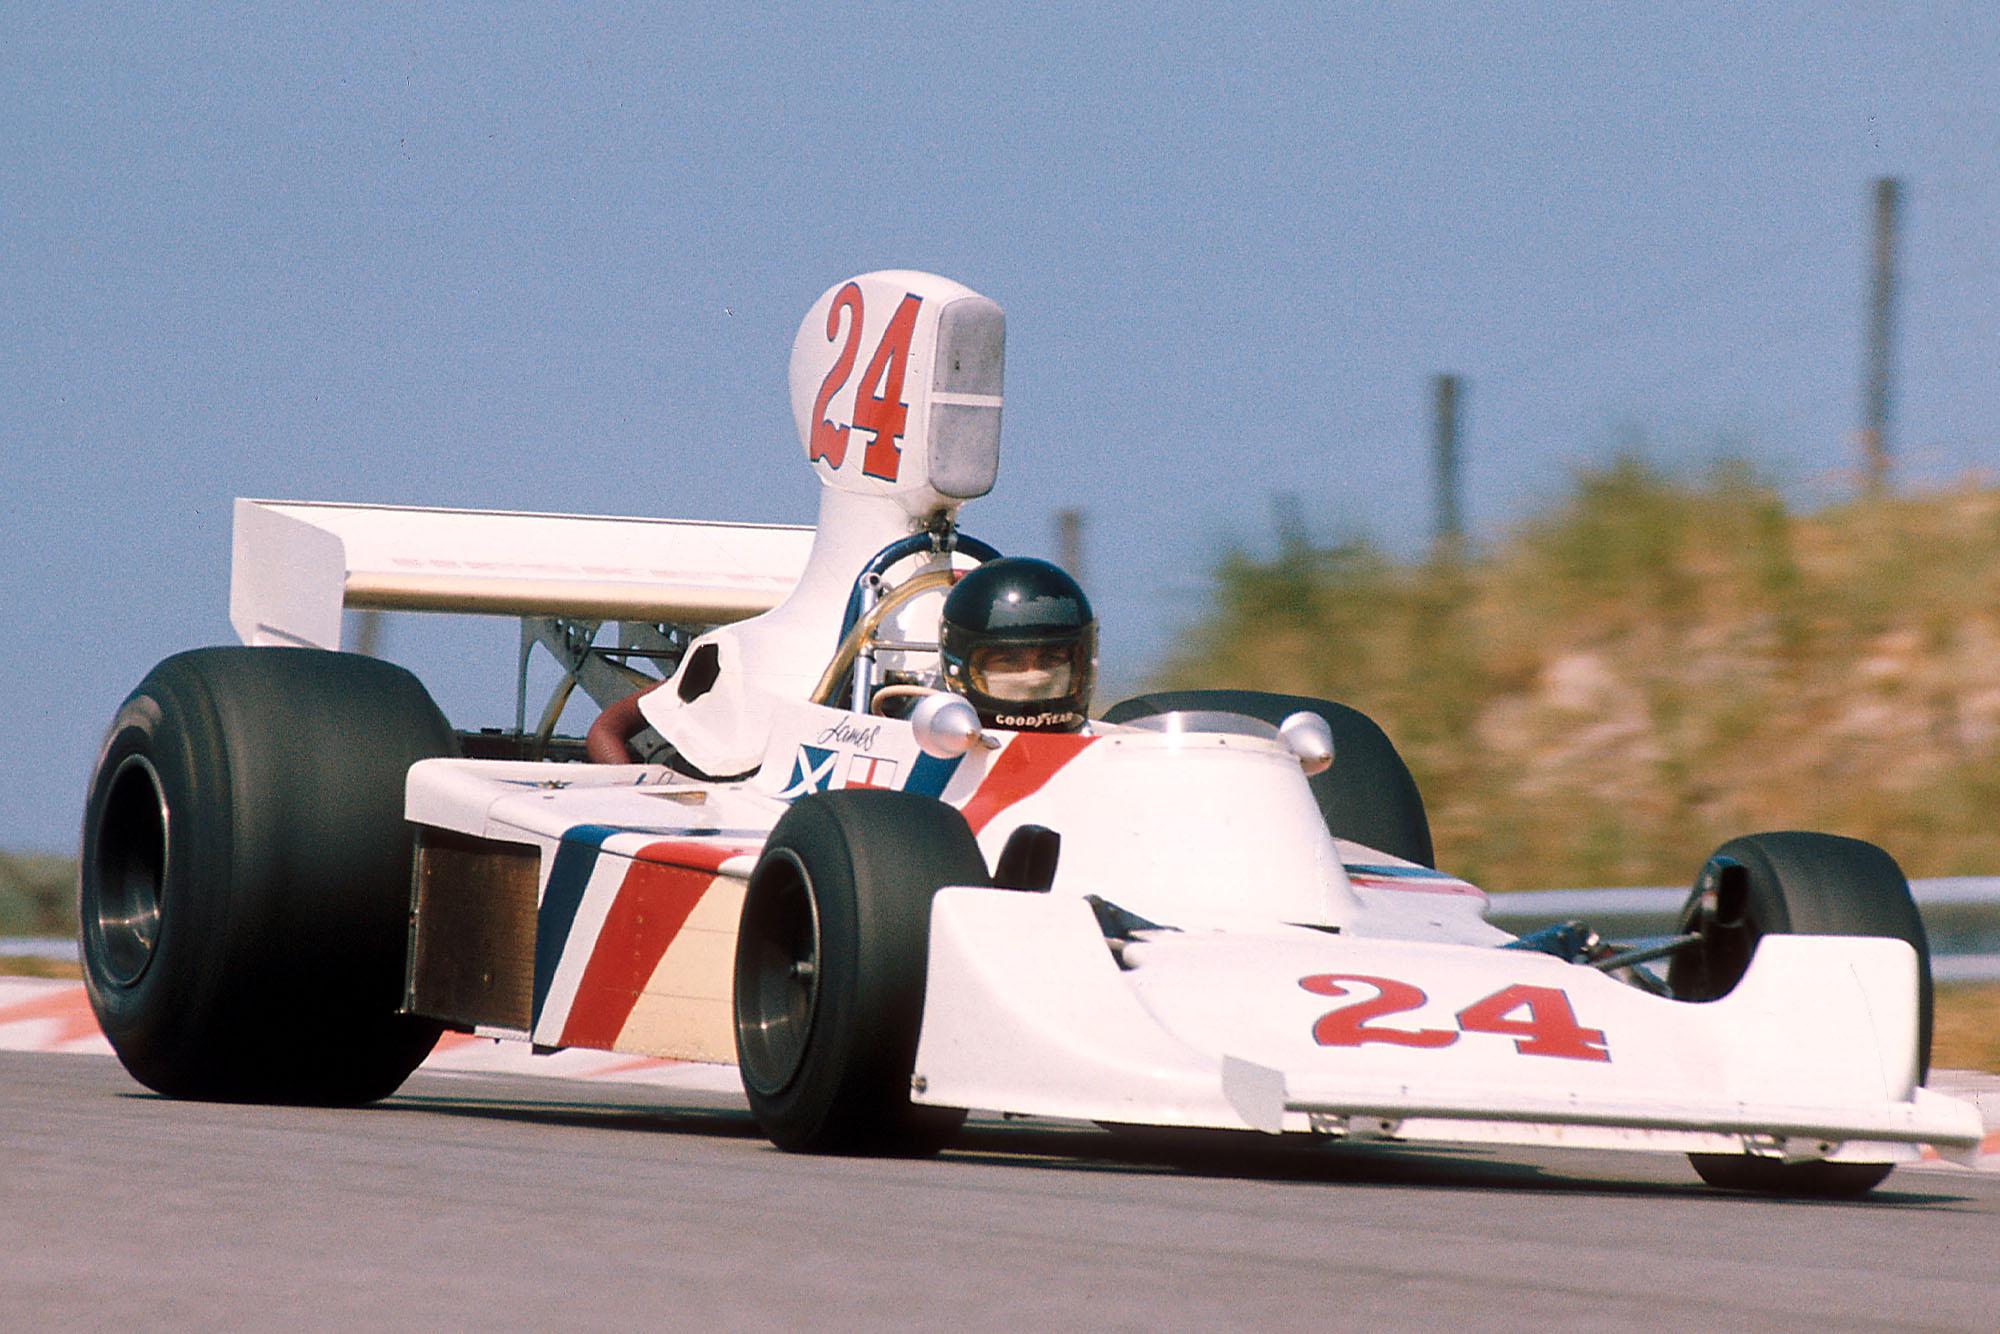 James Hunt (Hesketh) driving at the 1975 Dutch Grand Prix, Zandvoort.